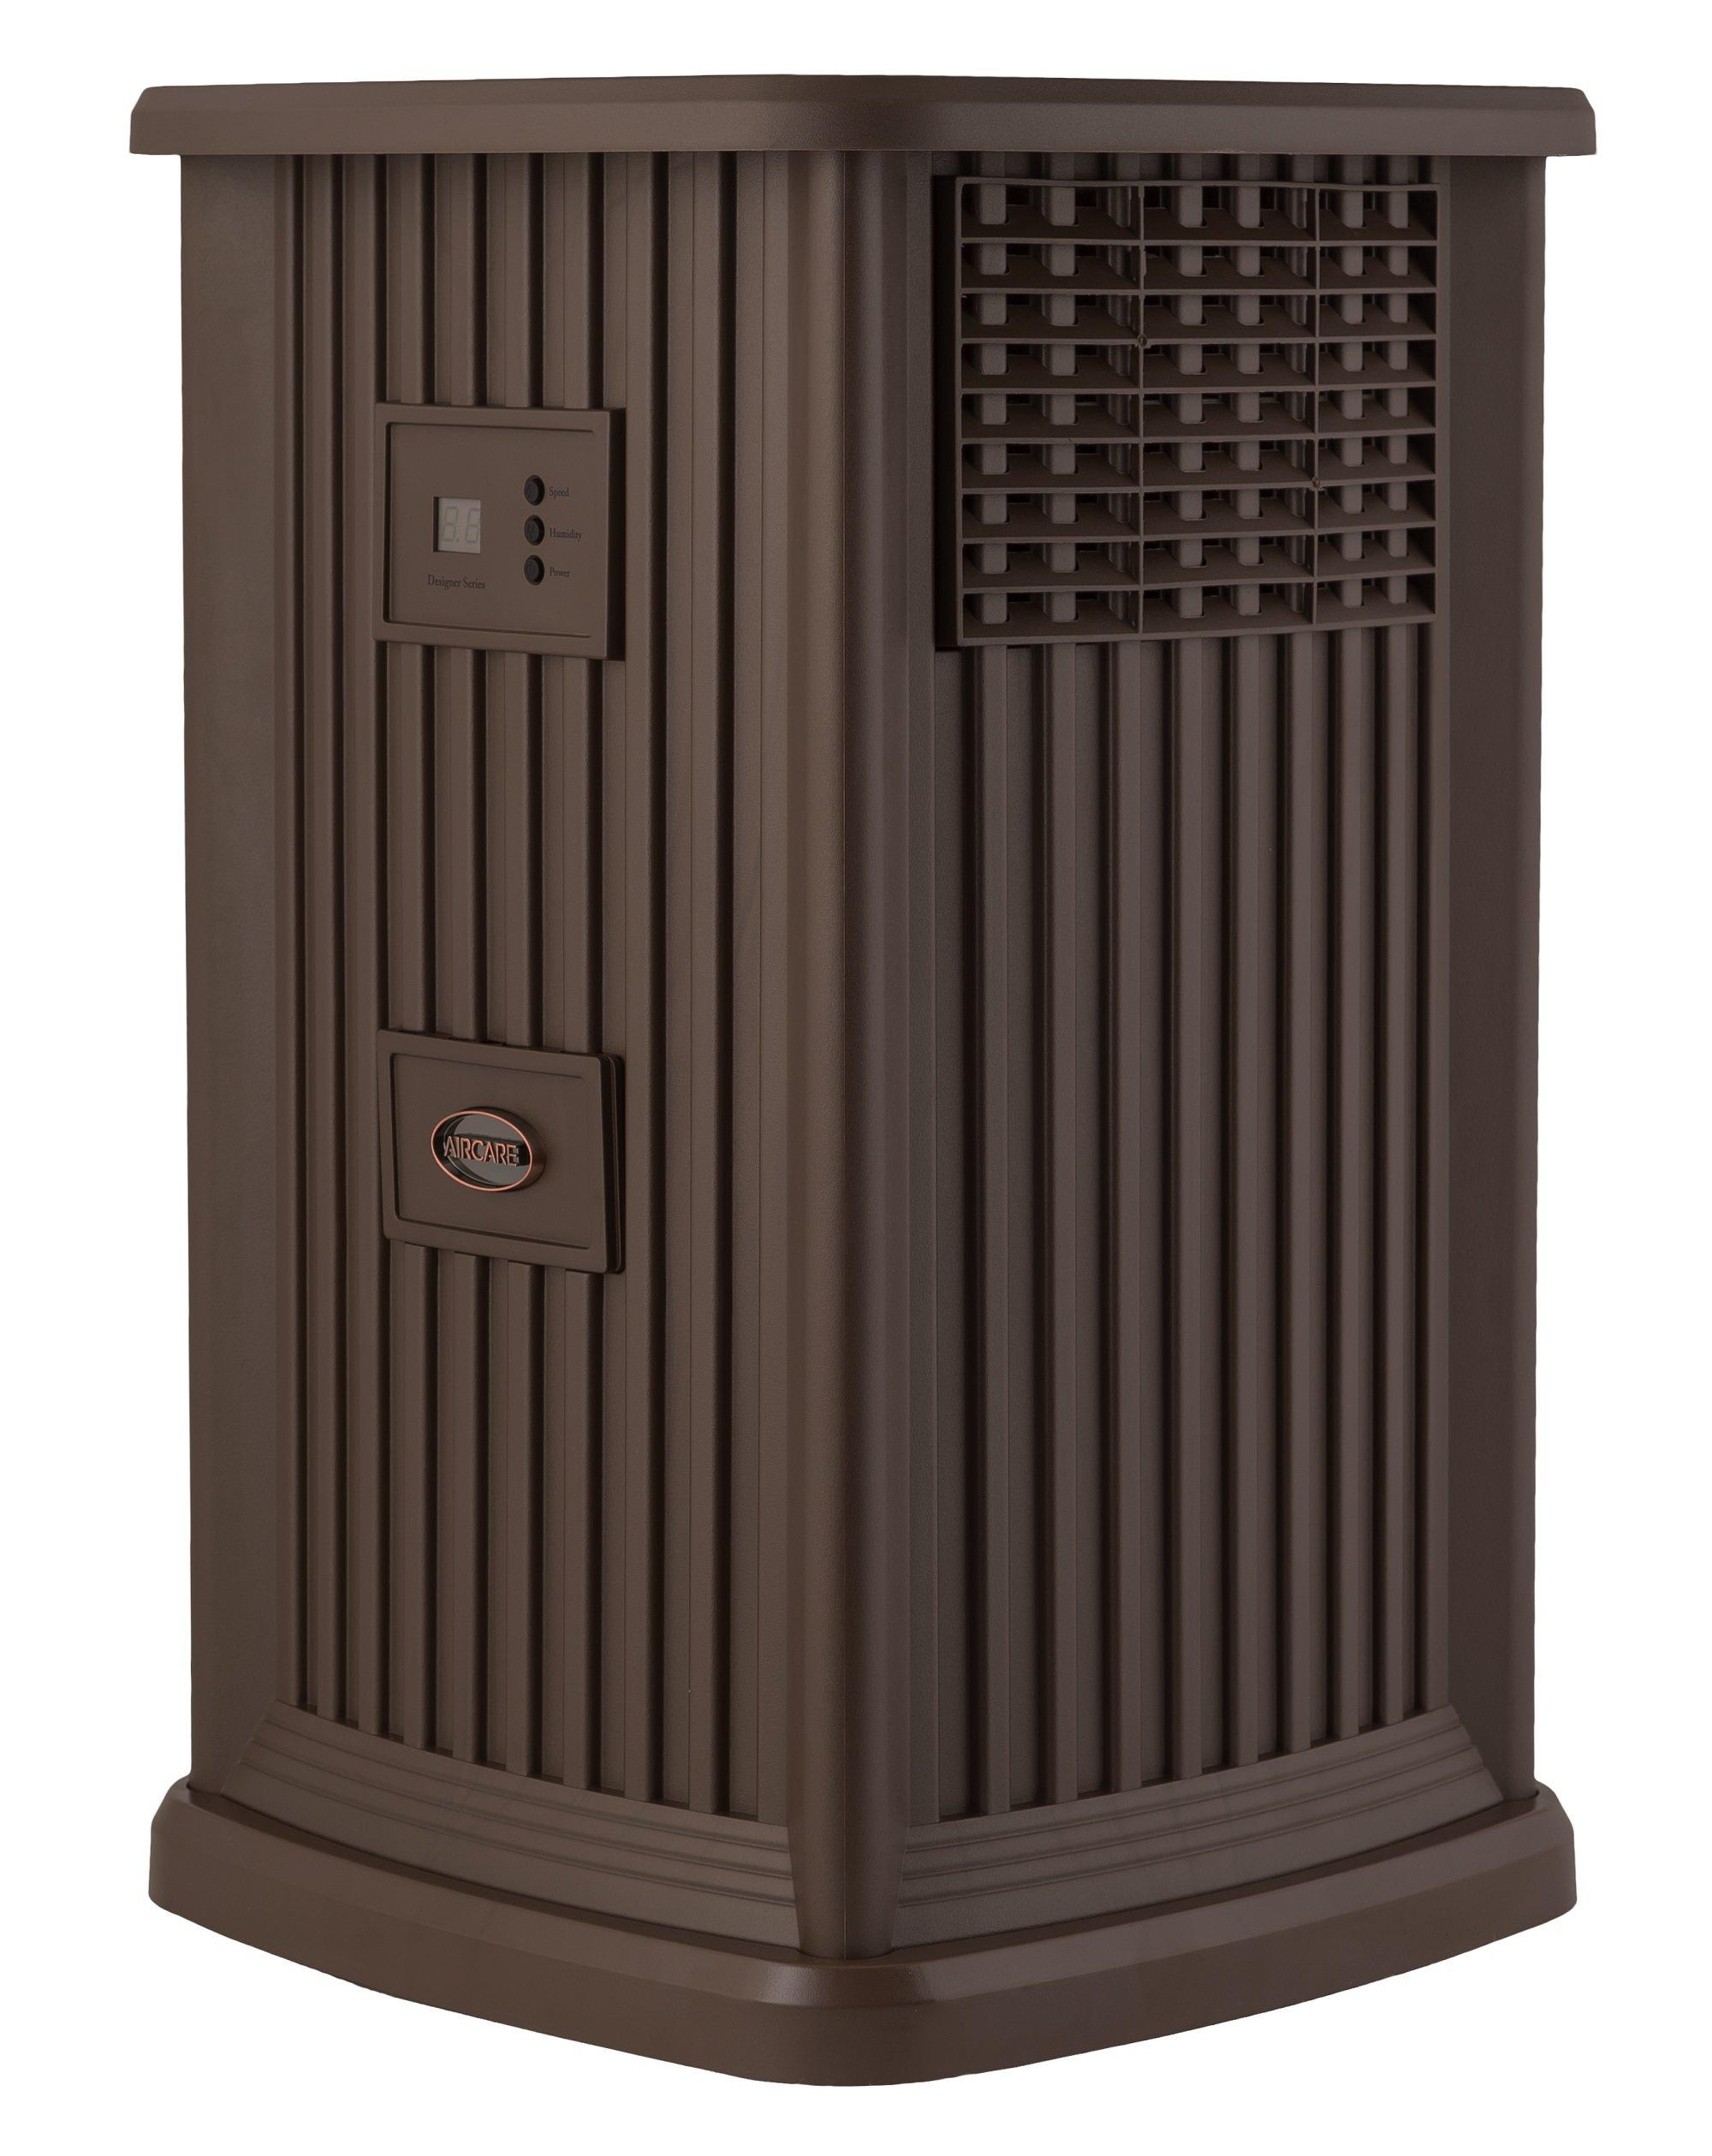 Aircare Ep9 500 Digital Style Nutmeg Whole House Pedestal